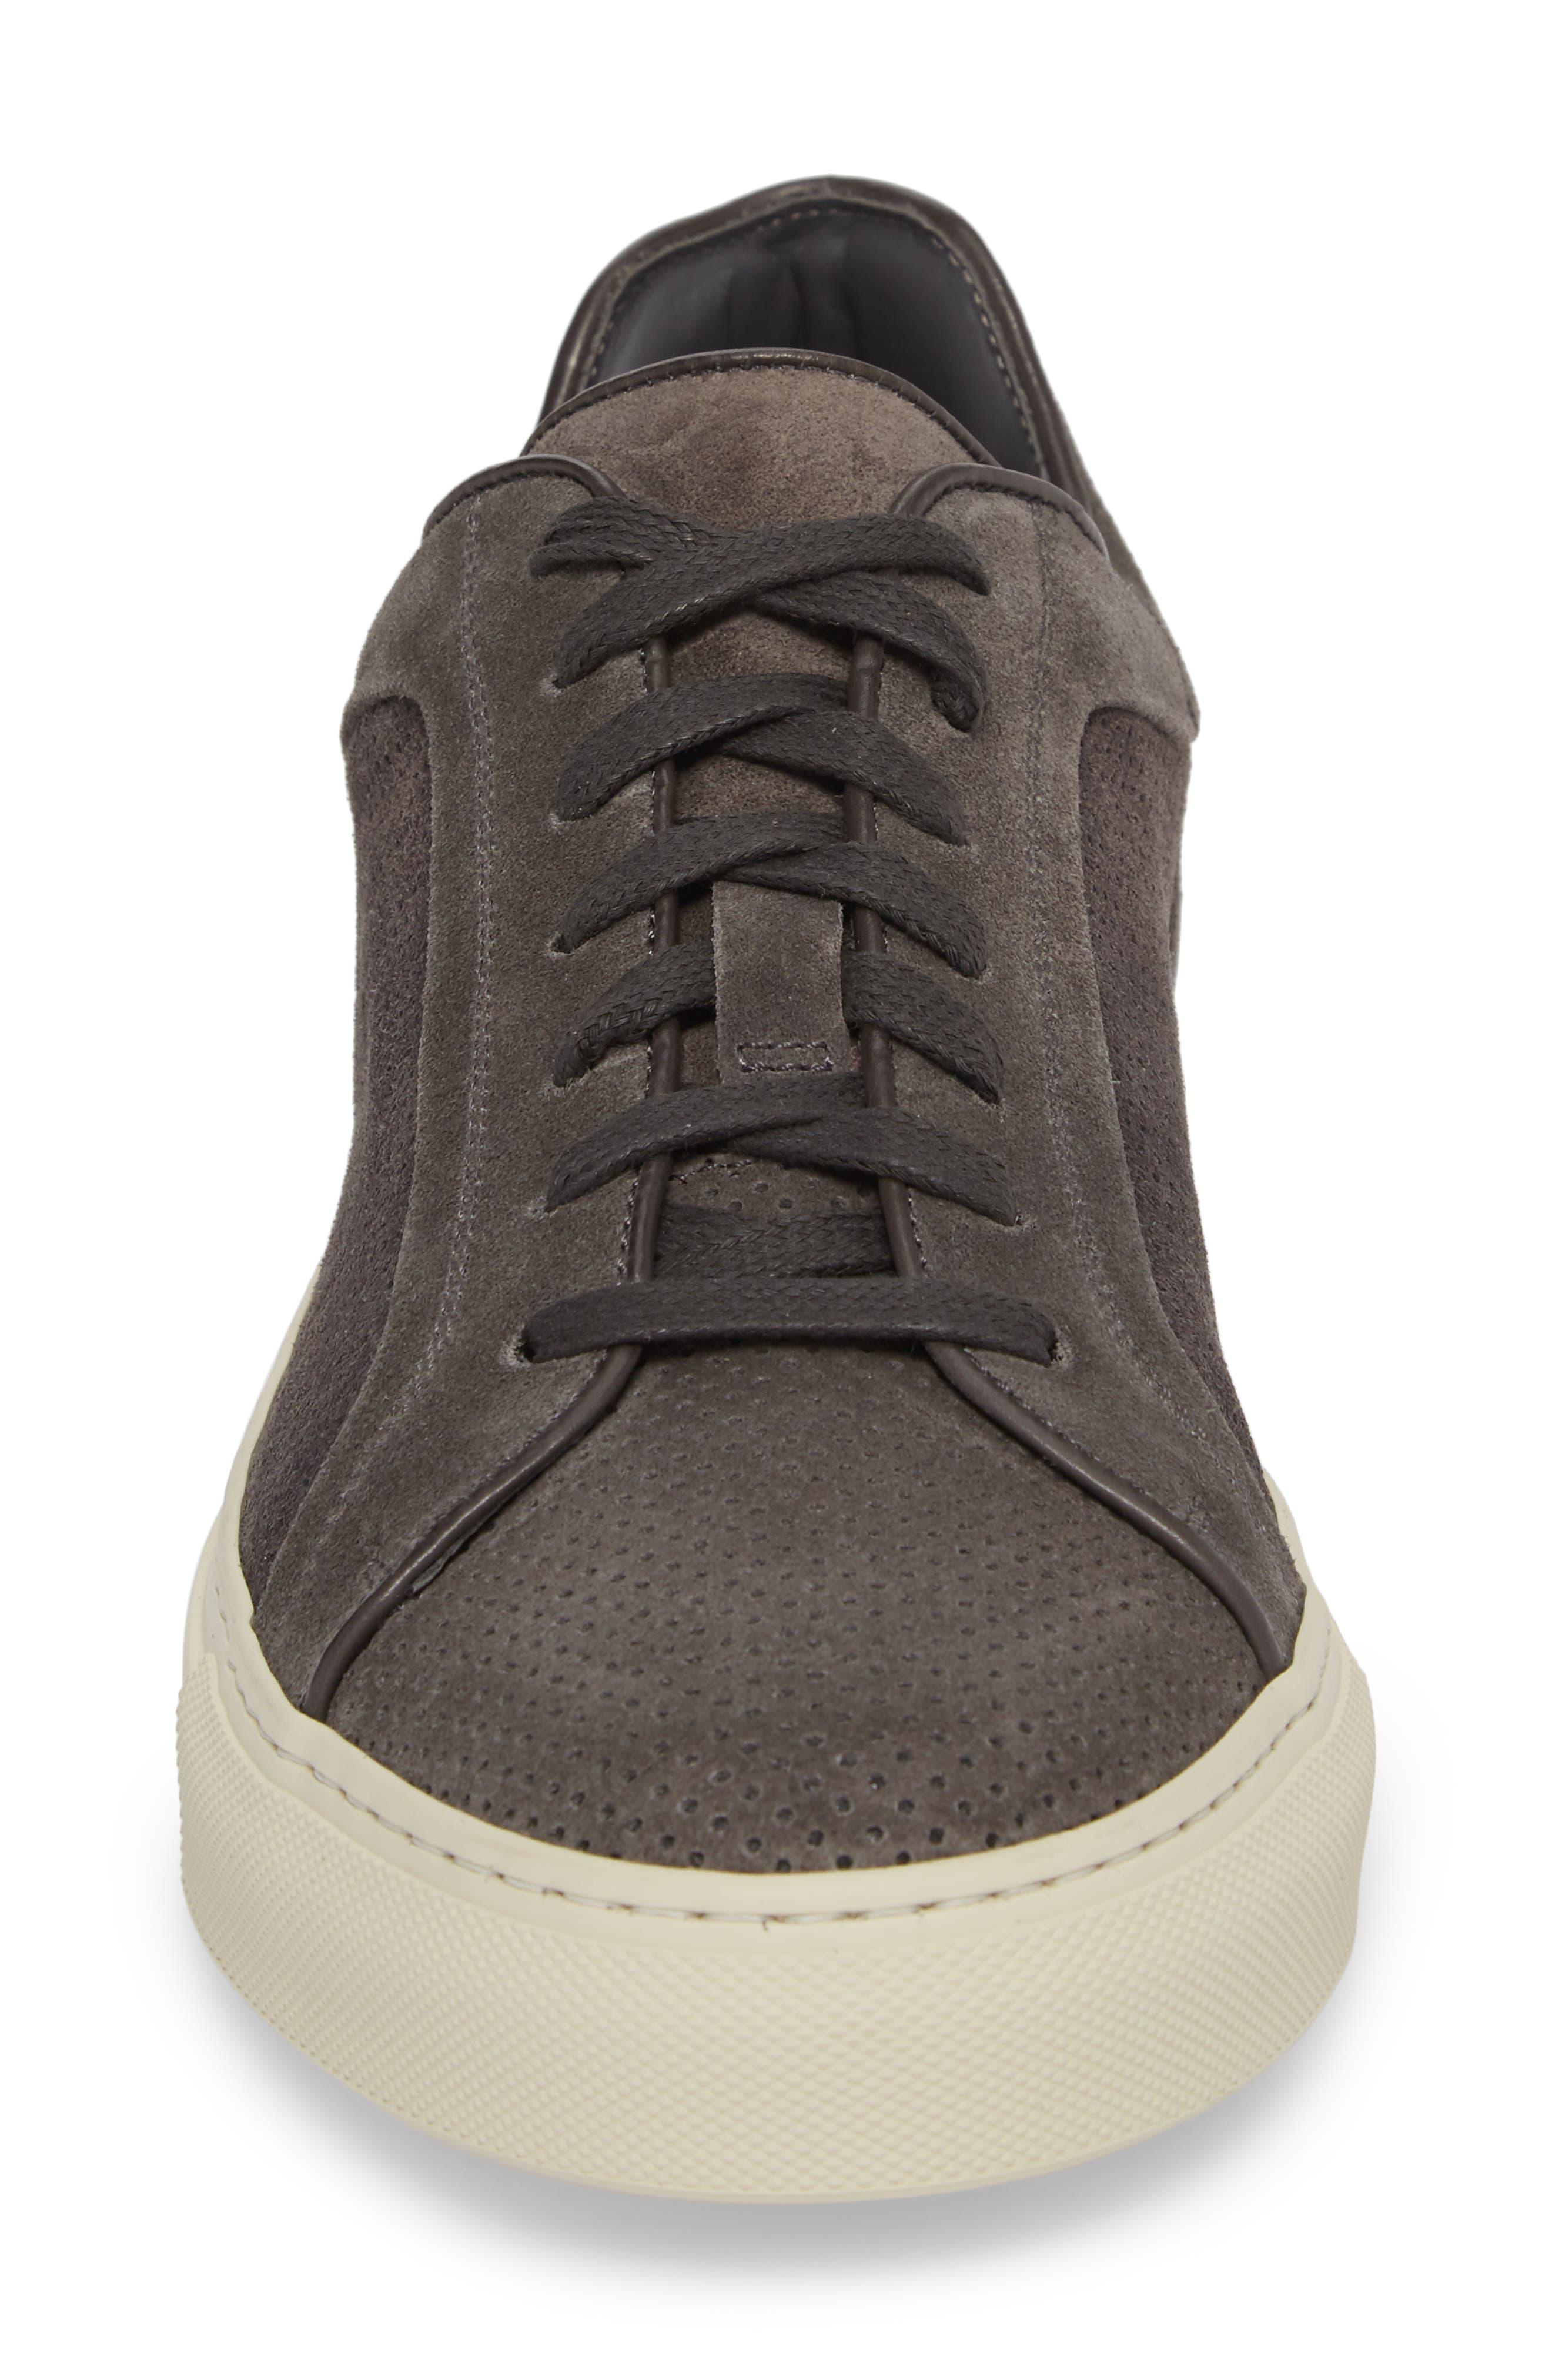 Hendrick Perforated Sneaker,                             Alternate thumbnail 4, color,                             Lavagna